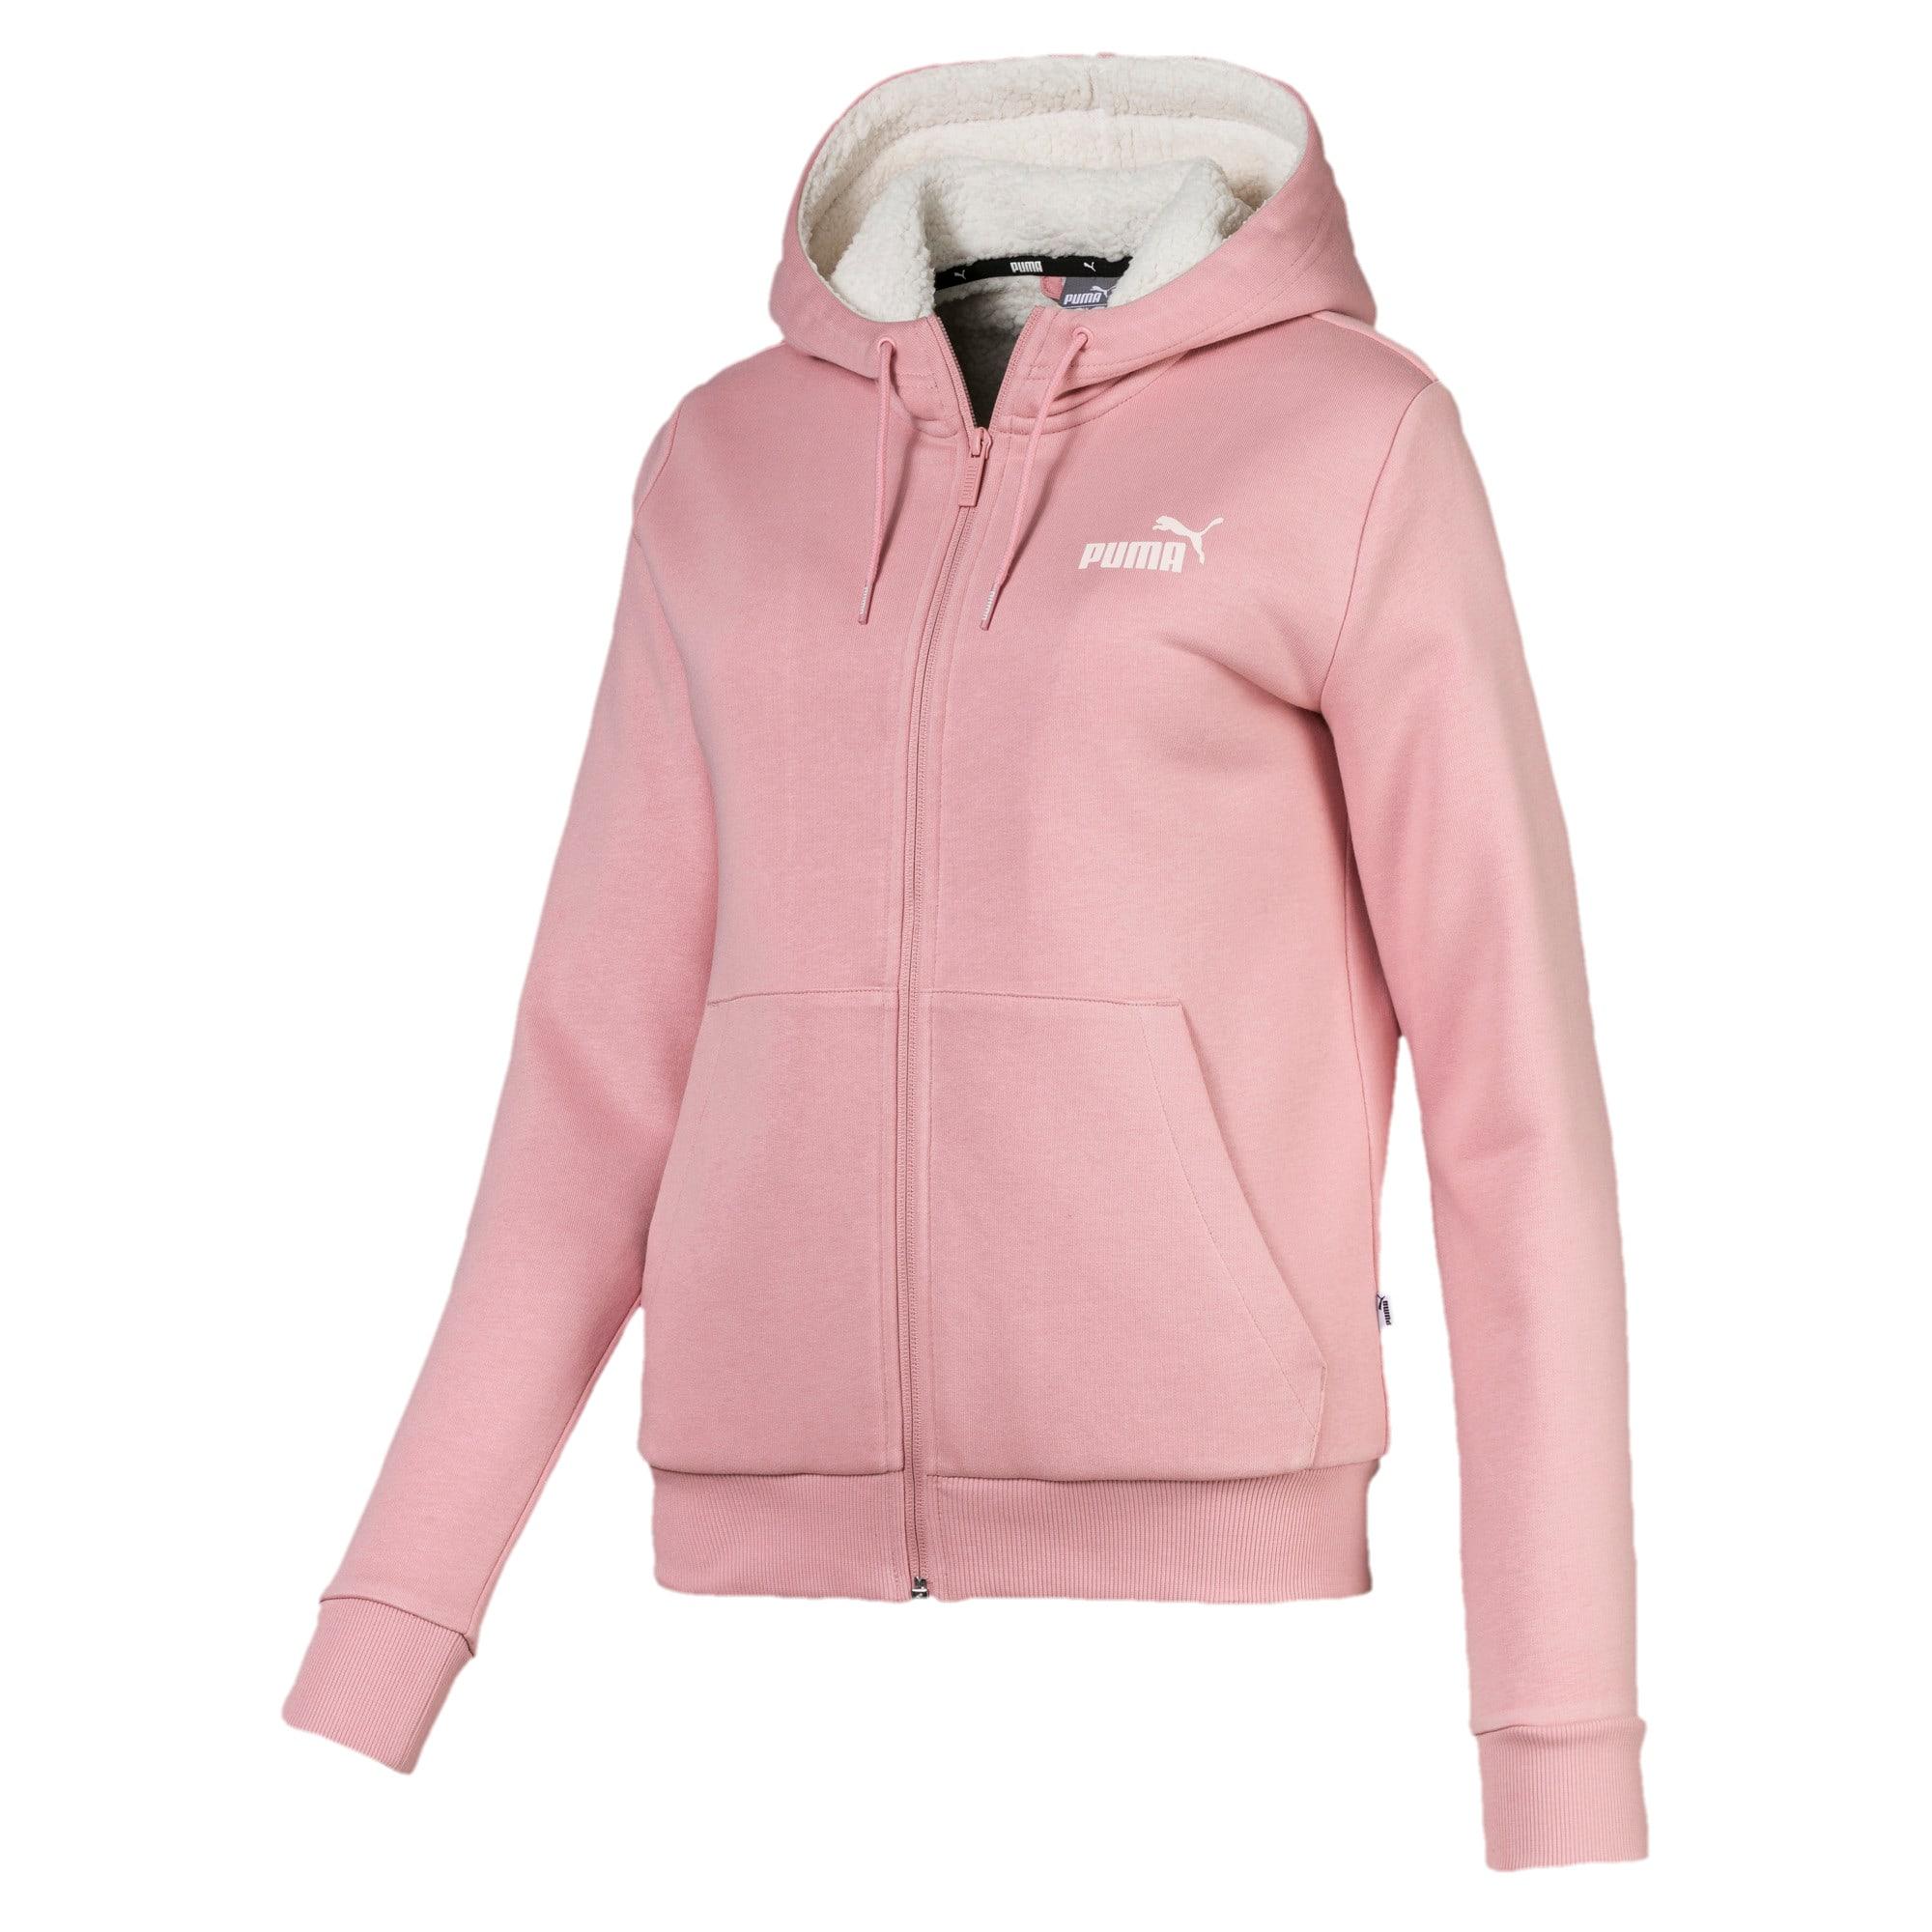 Thumbnail 4 of Essentials Sherpa Hooded Women's Jacket, Bridal Rose, medium